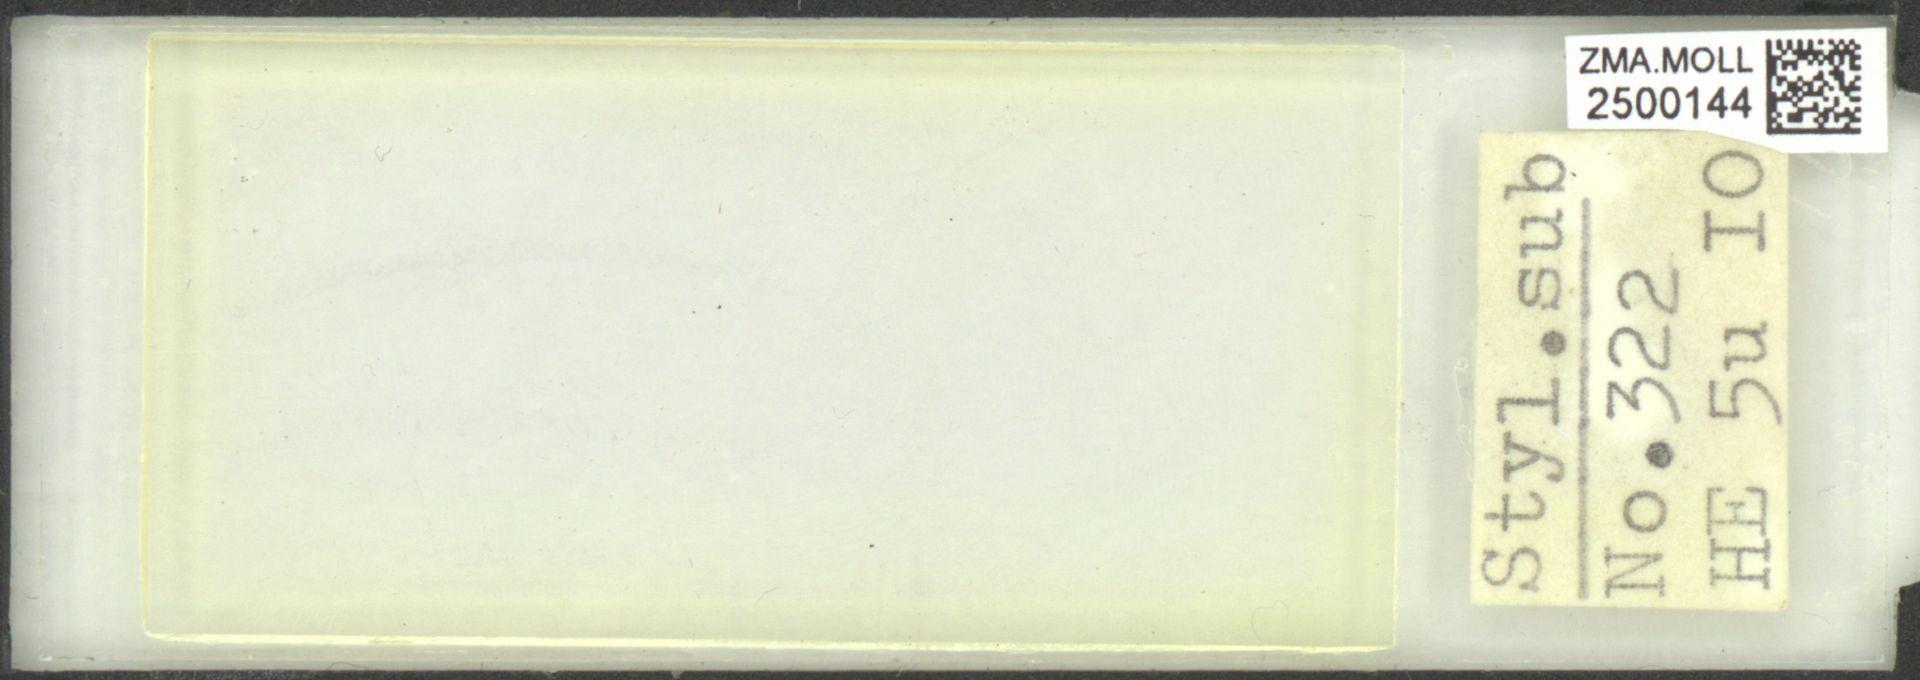 ZMA.MOLL.2500144 | Styliola subula (Quoy & Gaimard, 1827)